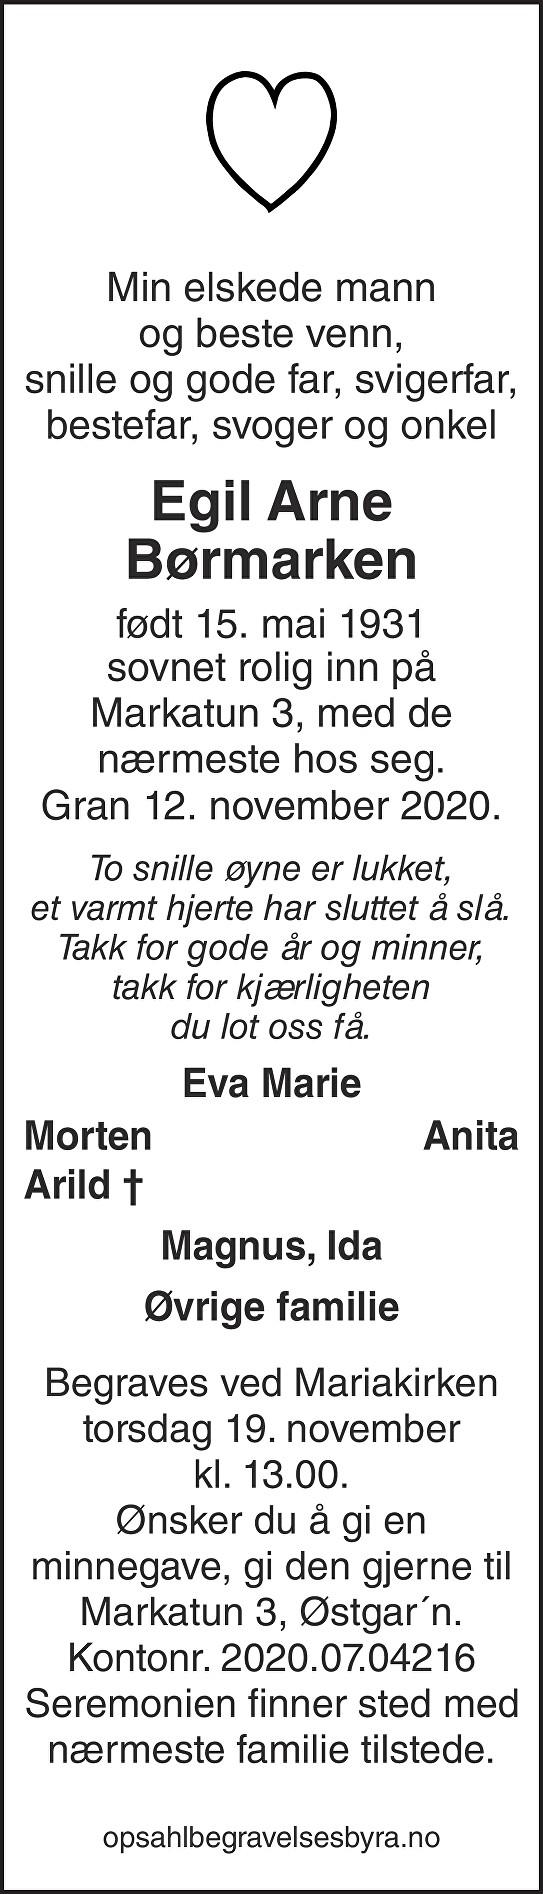 Egil Arne Børmarken Dødsannonse